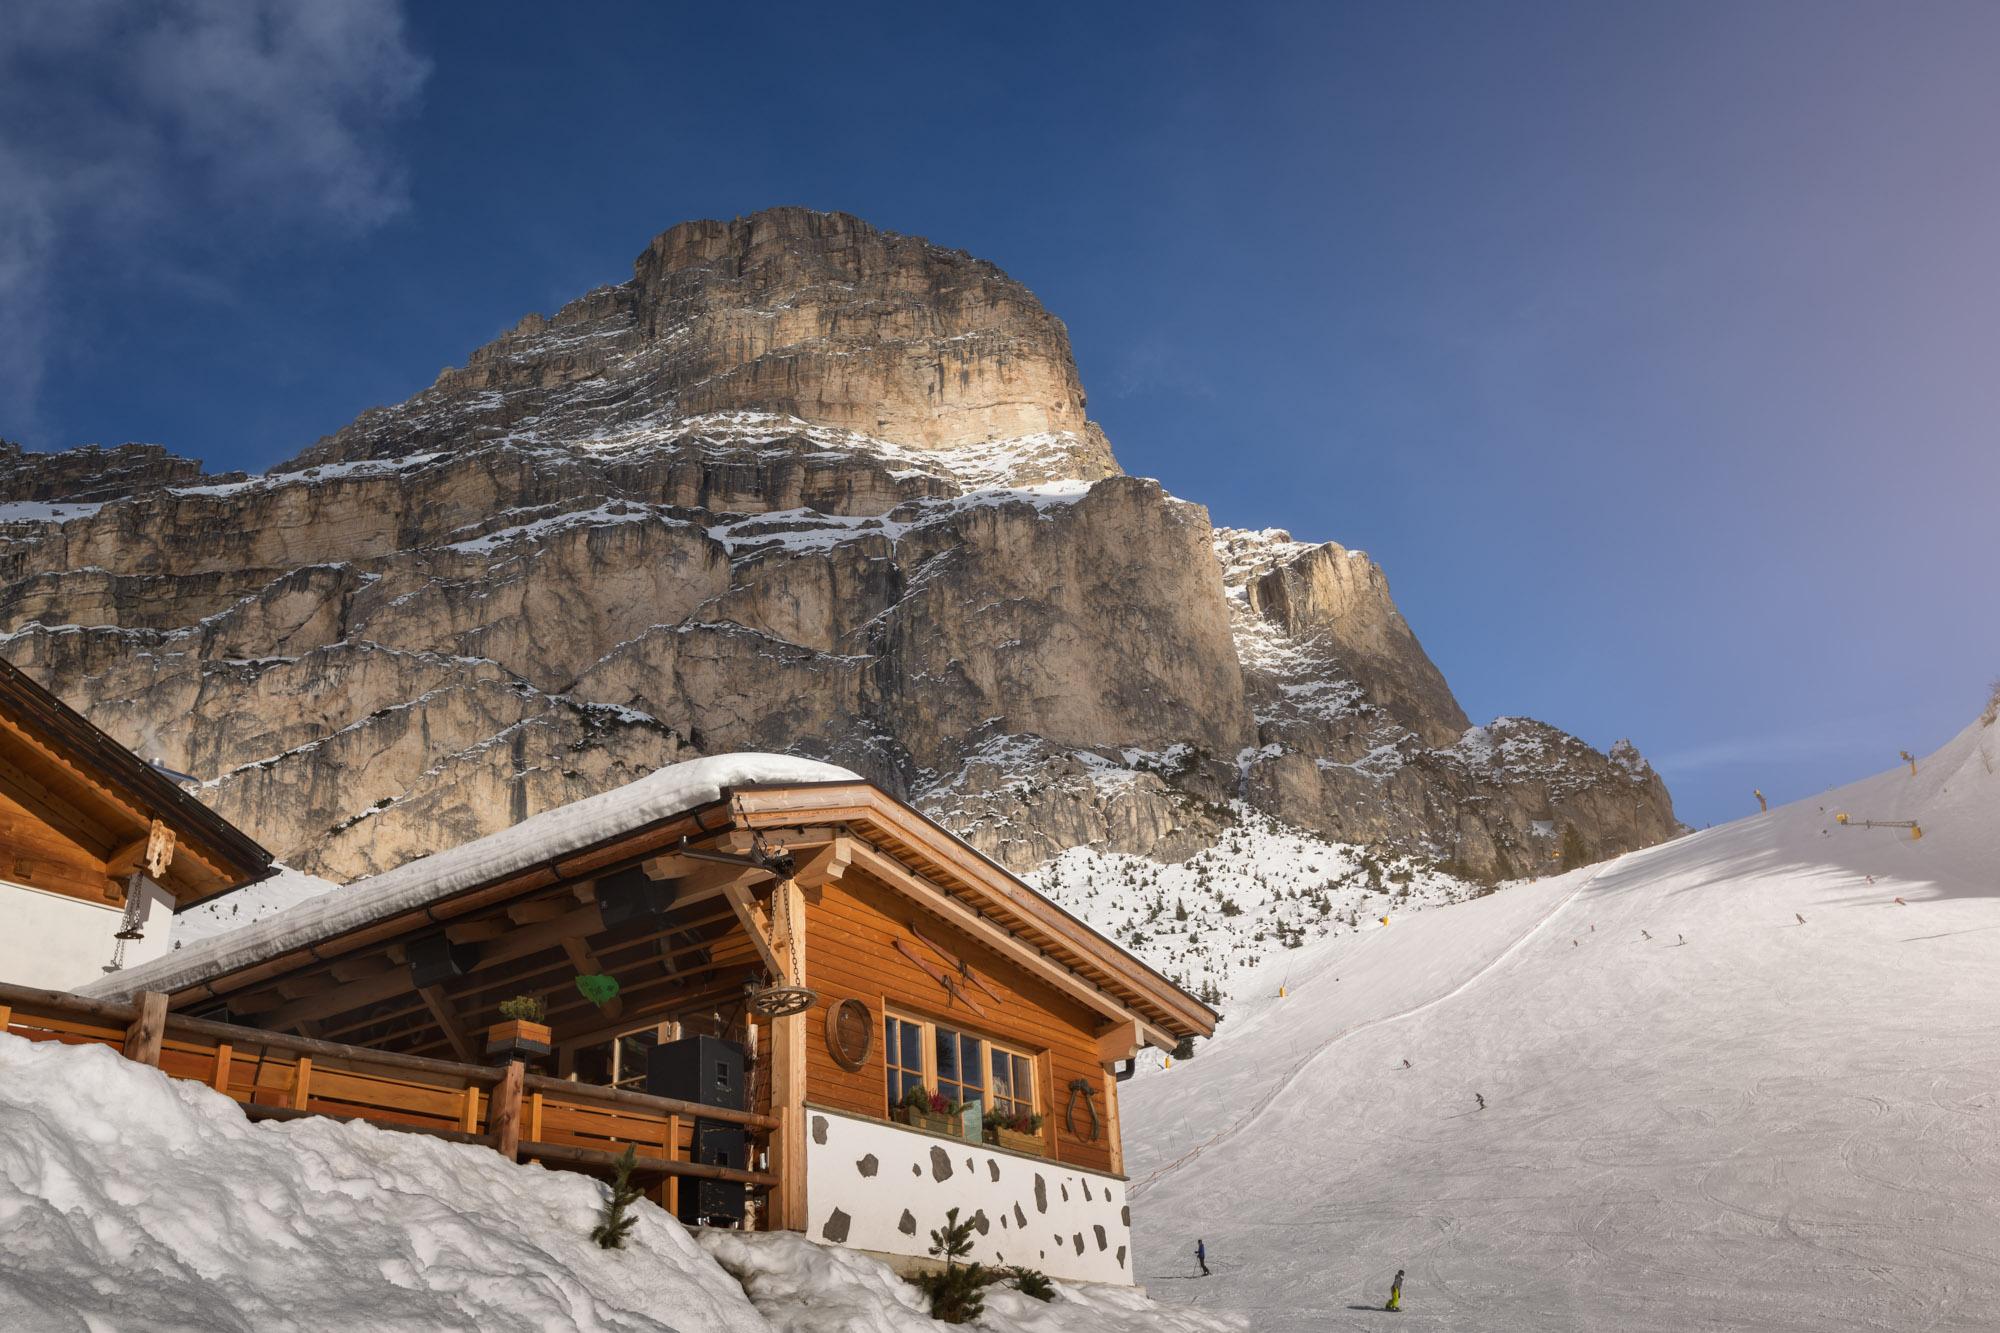 Rifugio Edelweiss, Colfosco, Alta Badia, Dolomites, Italy